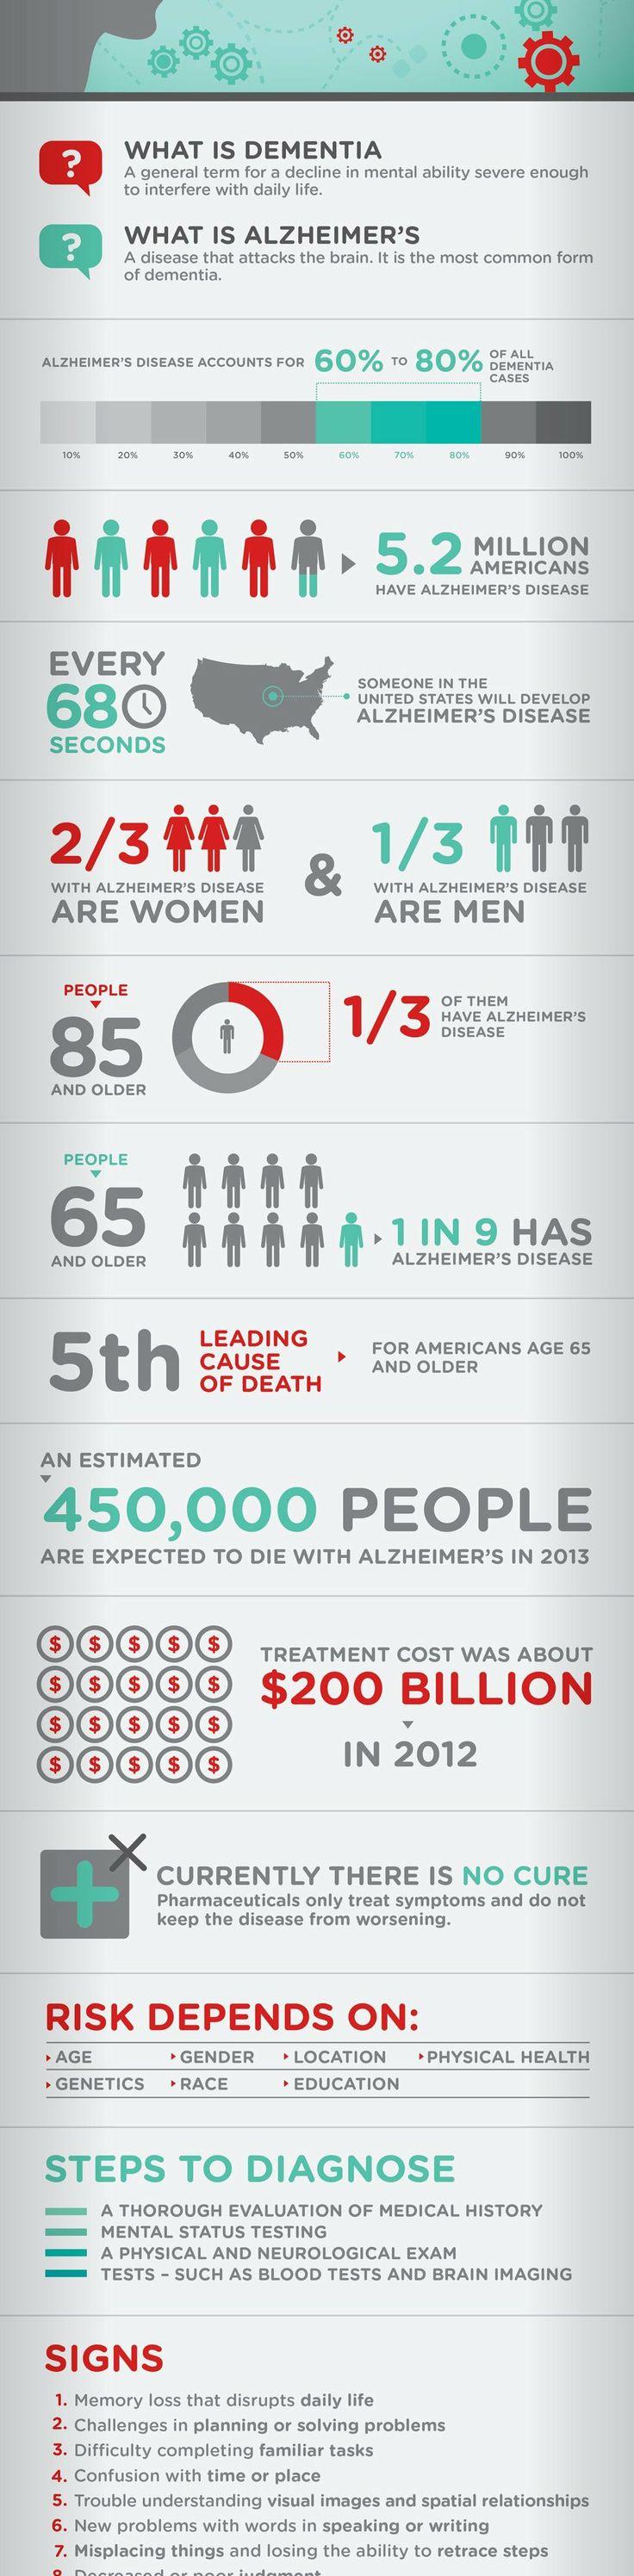 #Alzheimers and #Dementia #Infographic http://www.a-health-blog.com/alzheimers-and-dementia-infographic.html?utm_content=bufferbcf04&utm_medium=social&ut...